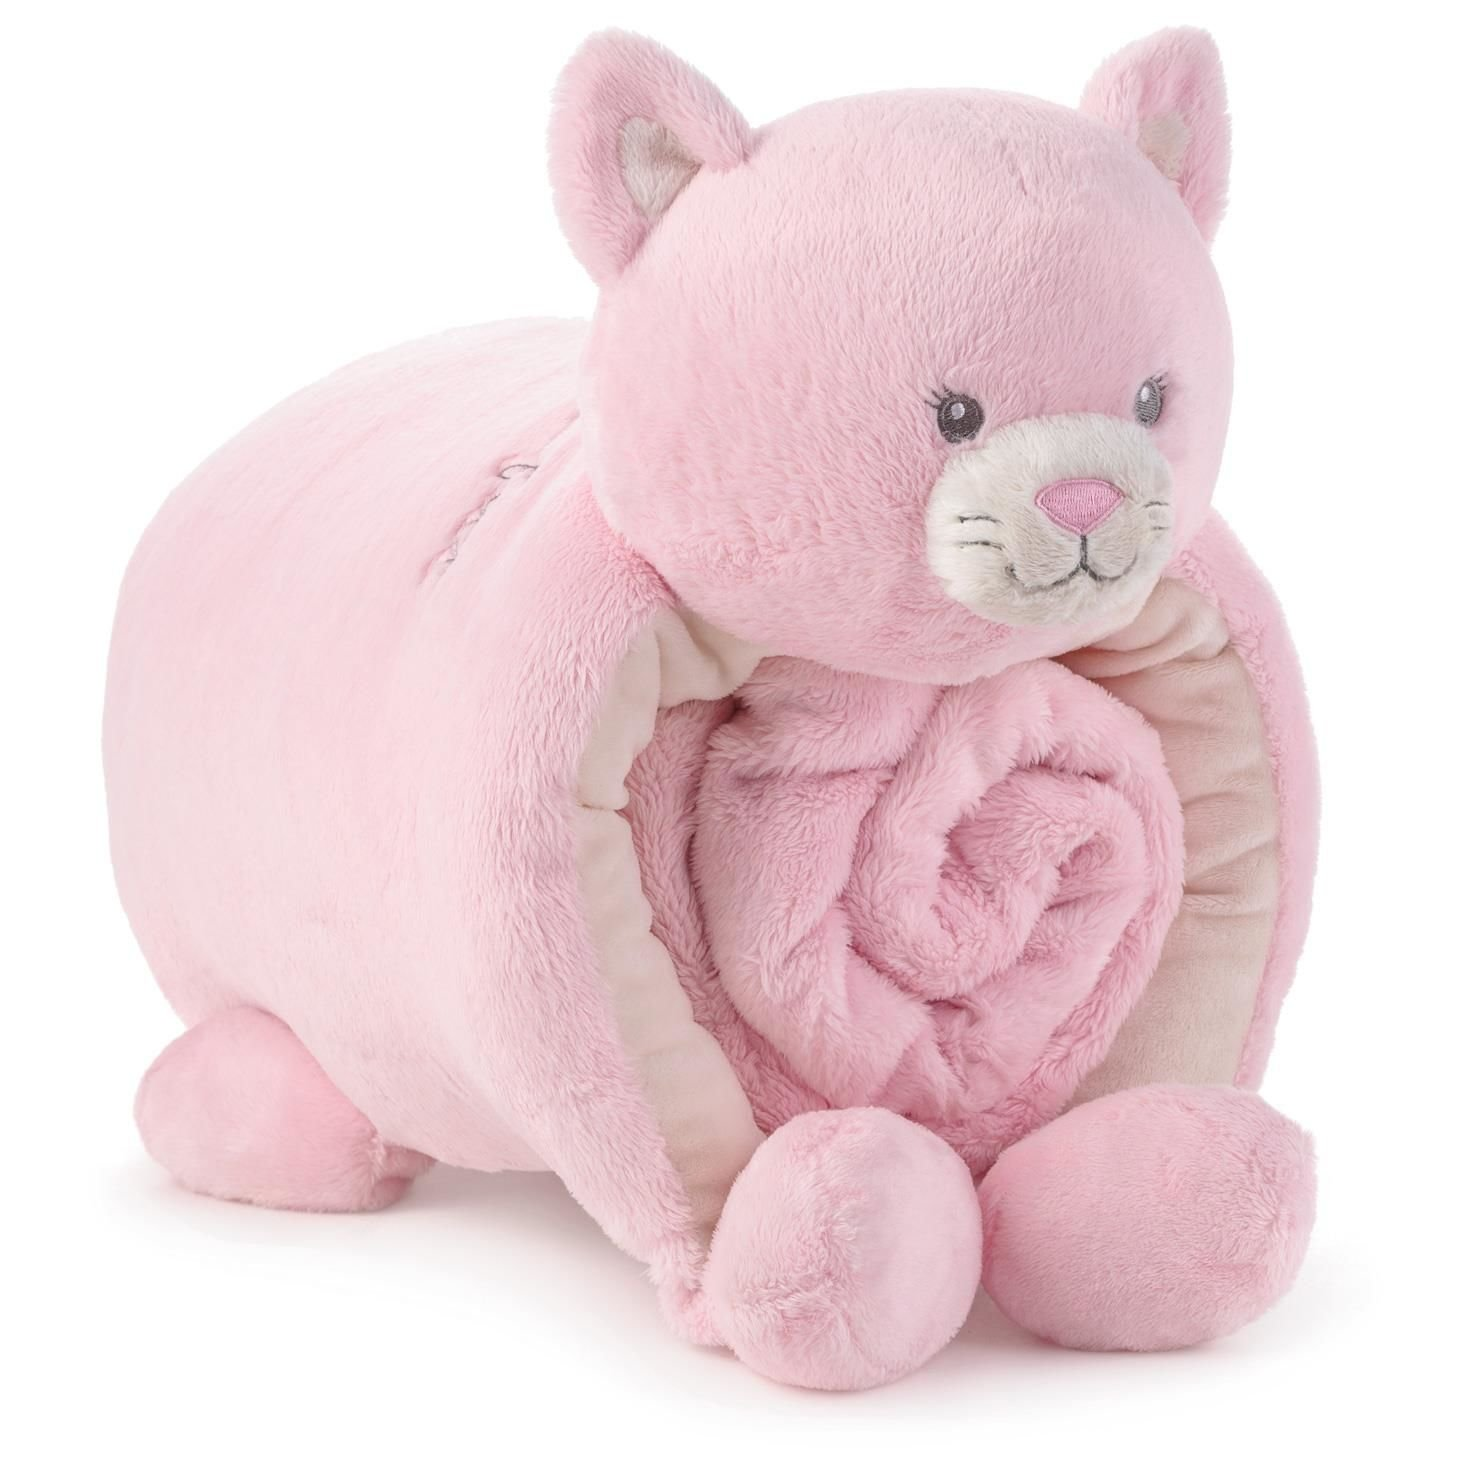 Hallmark Pink Kitty Pillow and Blanket Set